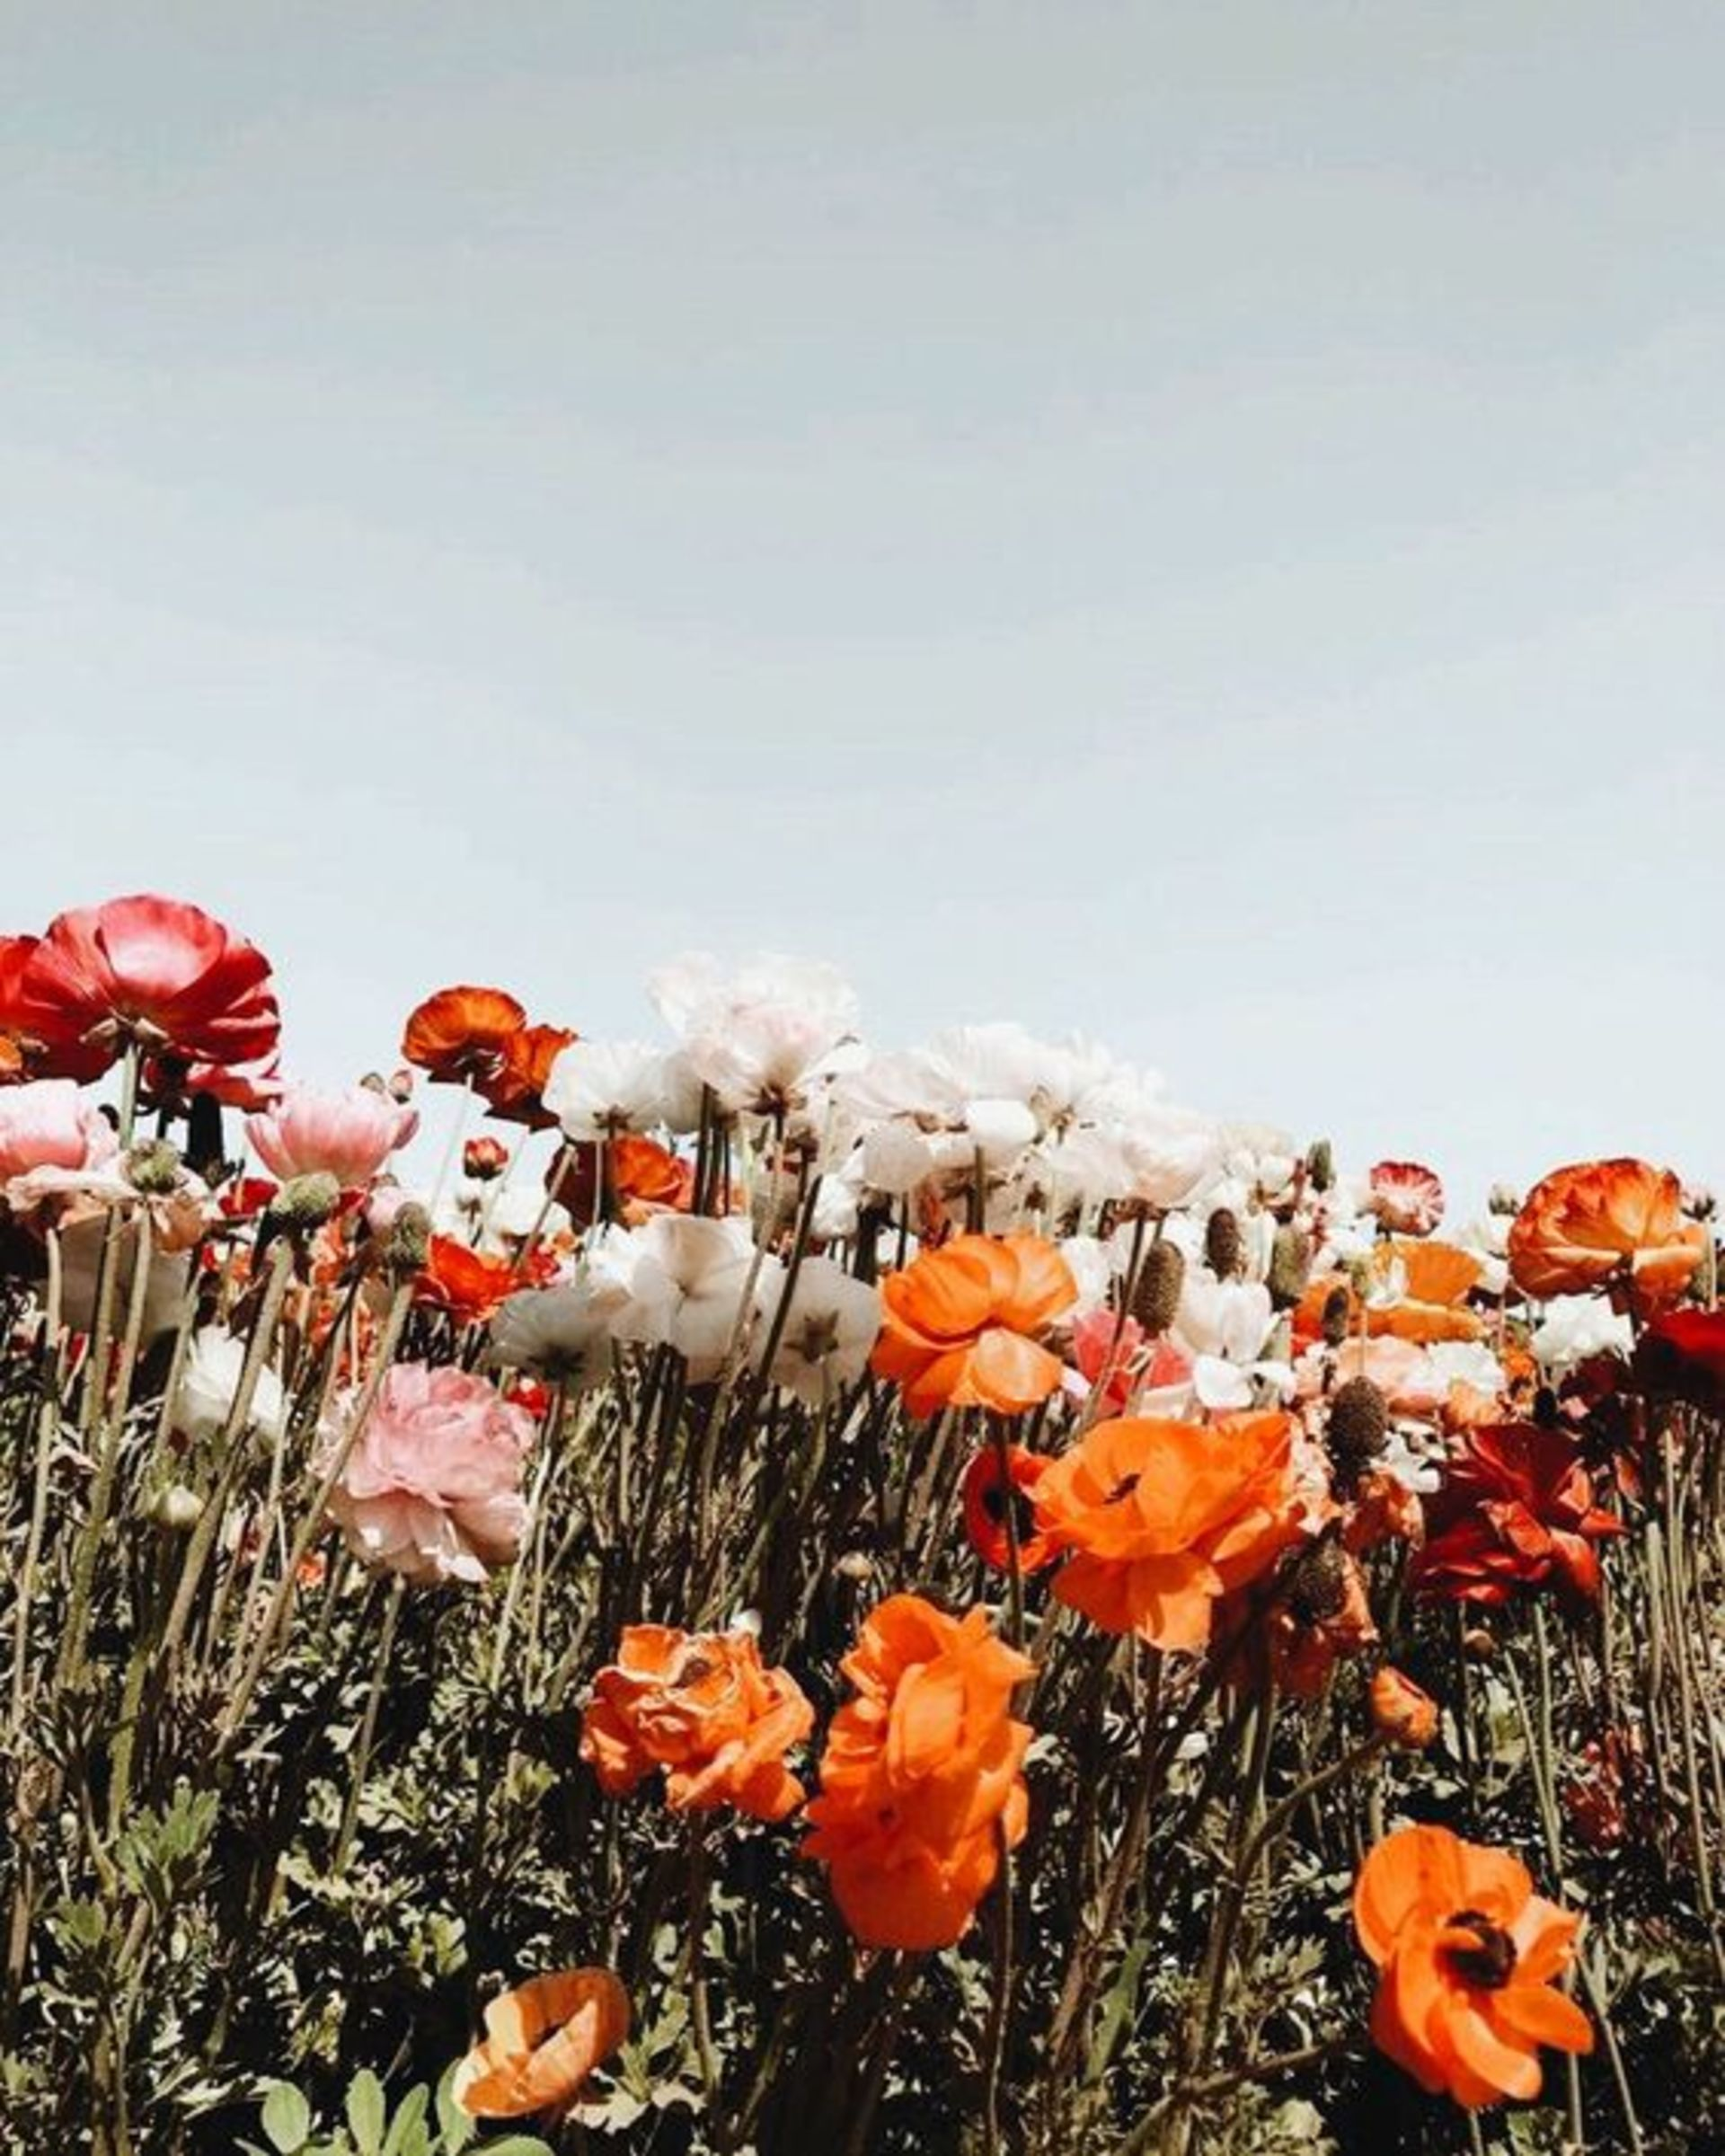 Weeds, Wildflowers or Invasive Plants?